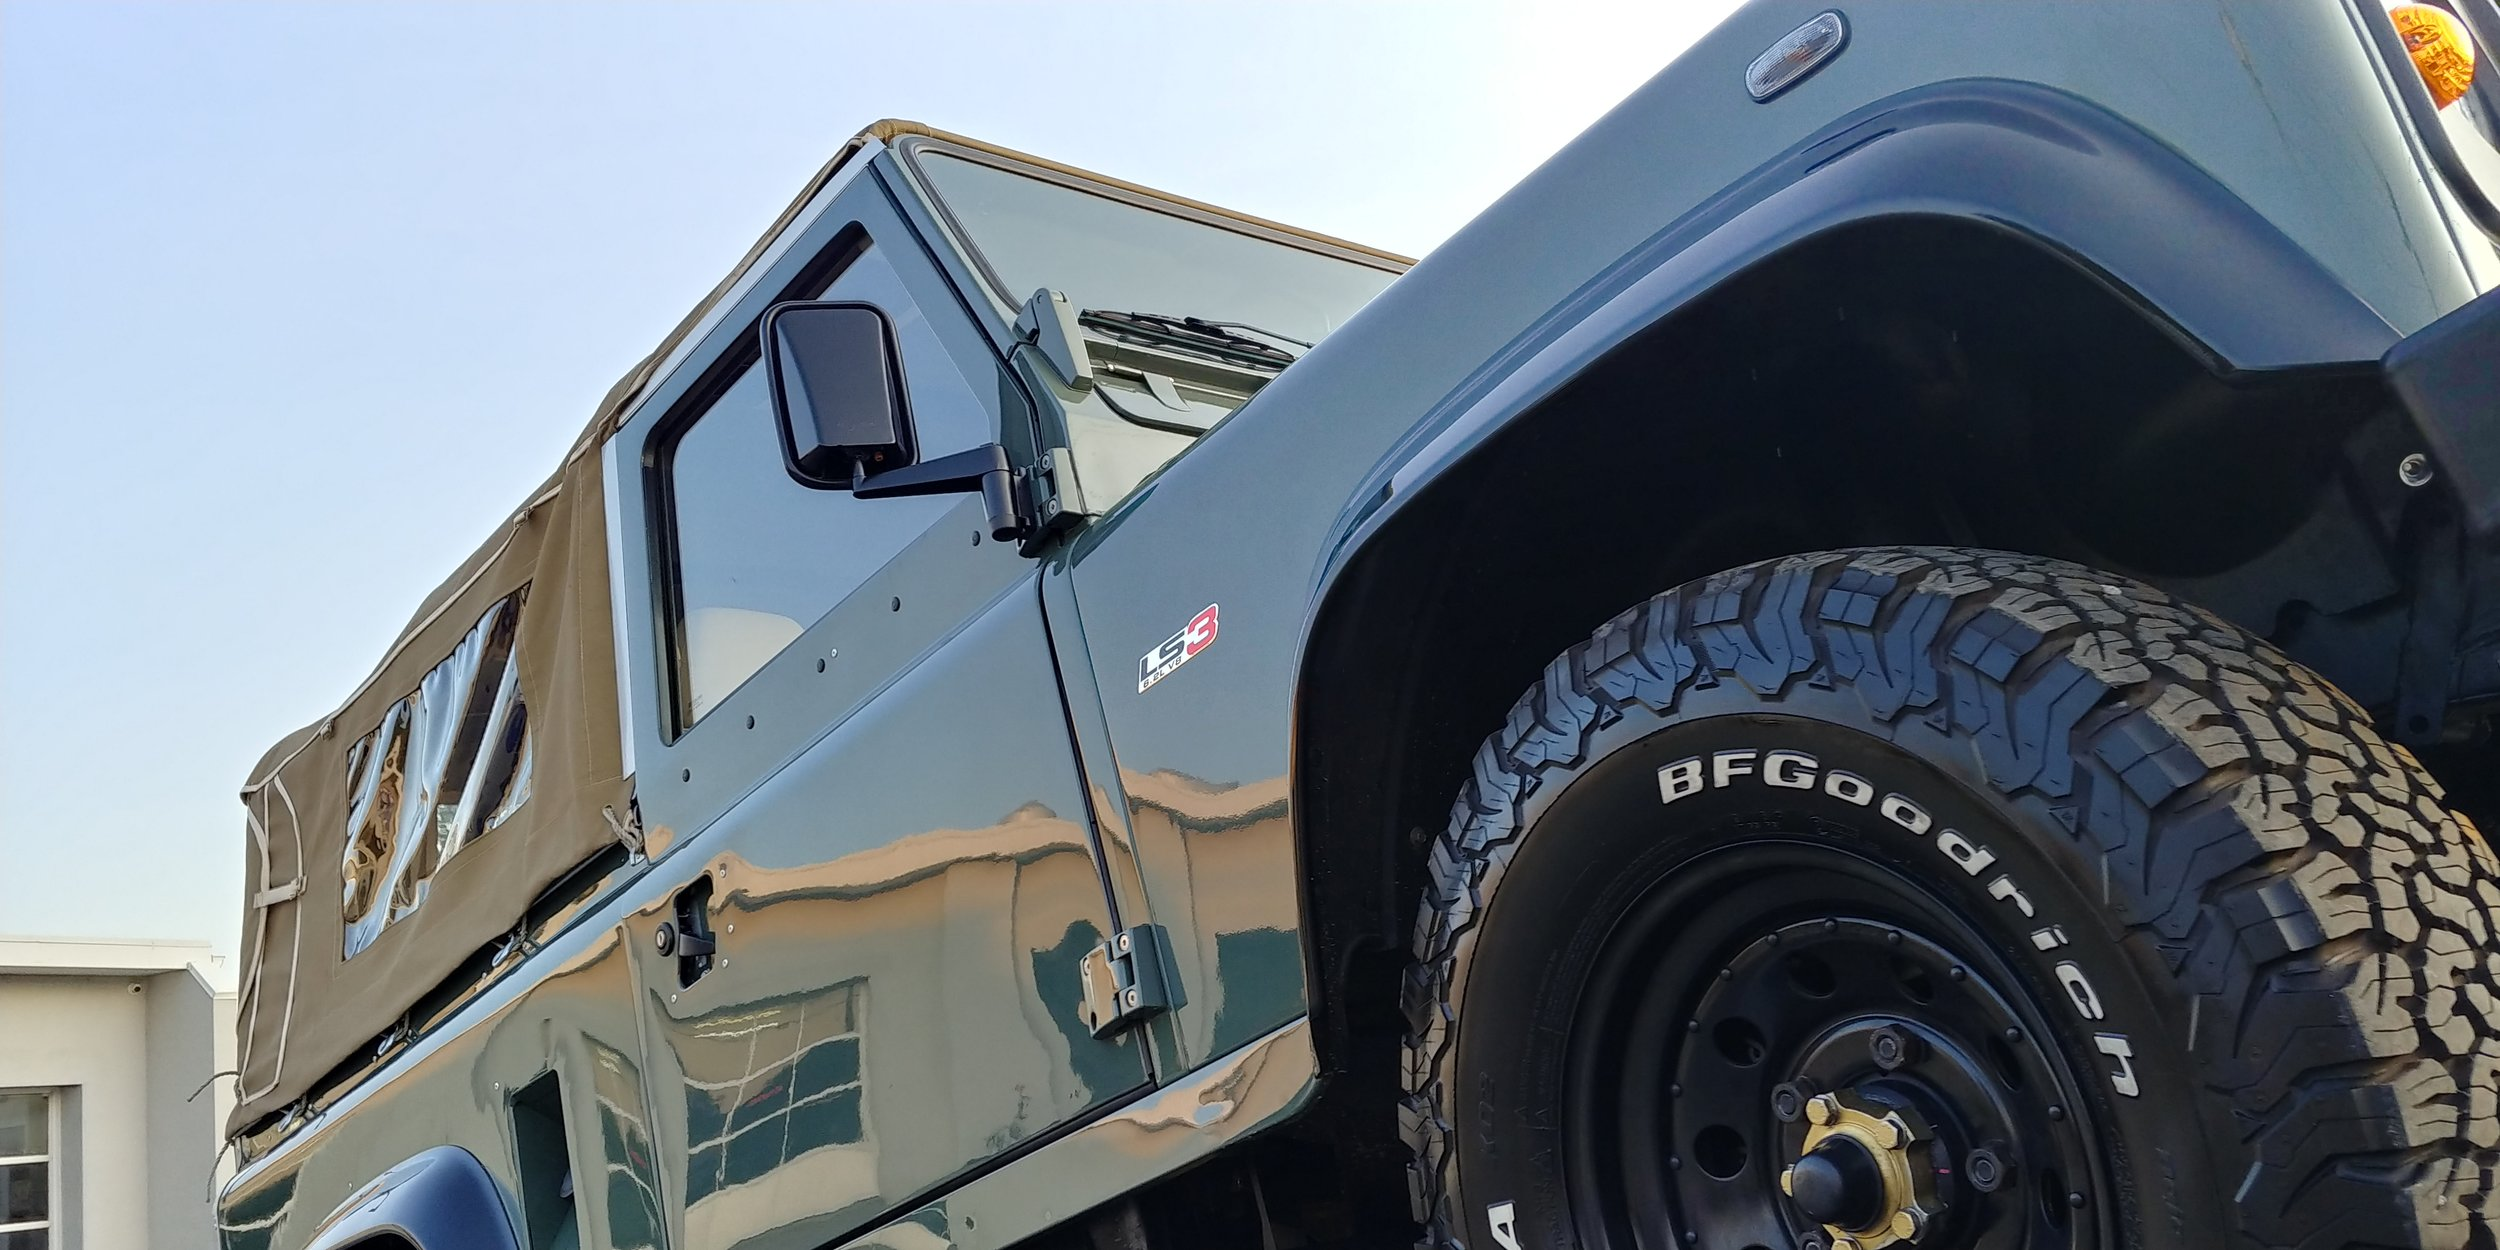 430 hp V8, automatic Defender 90